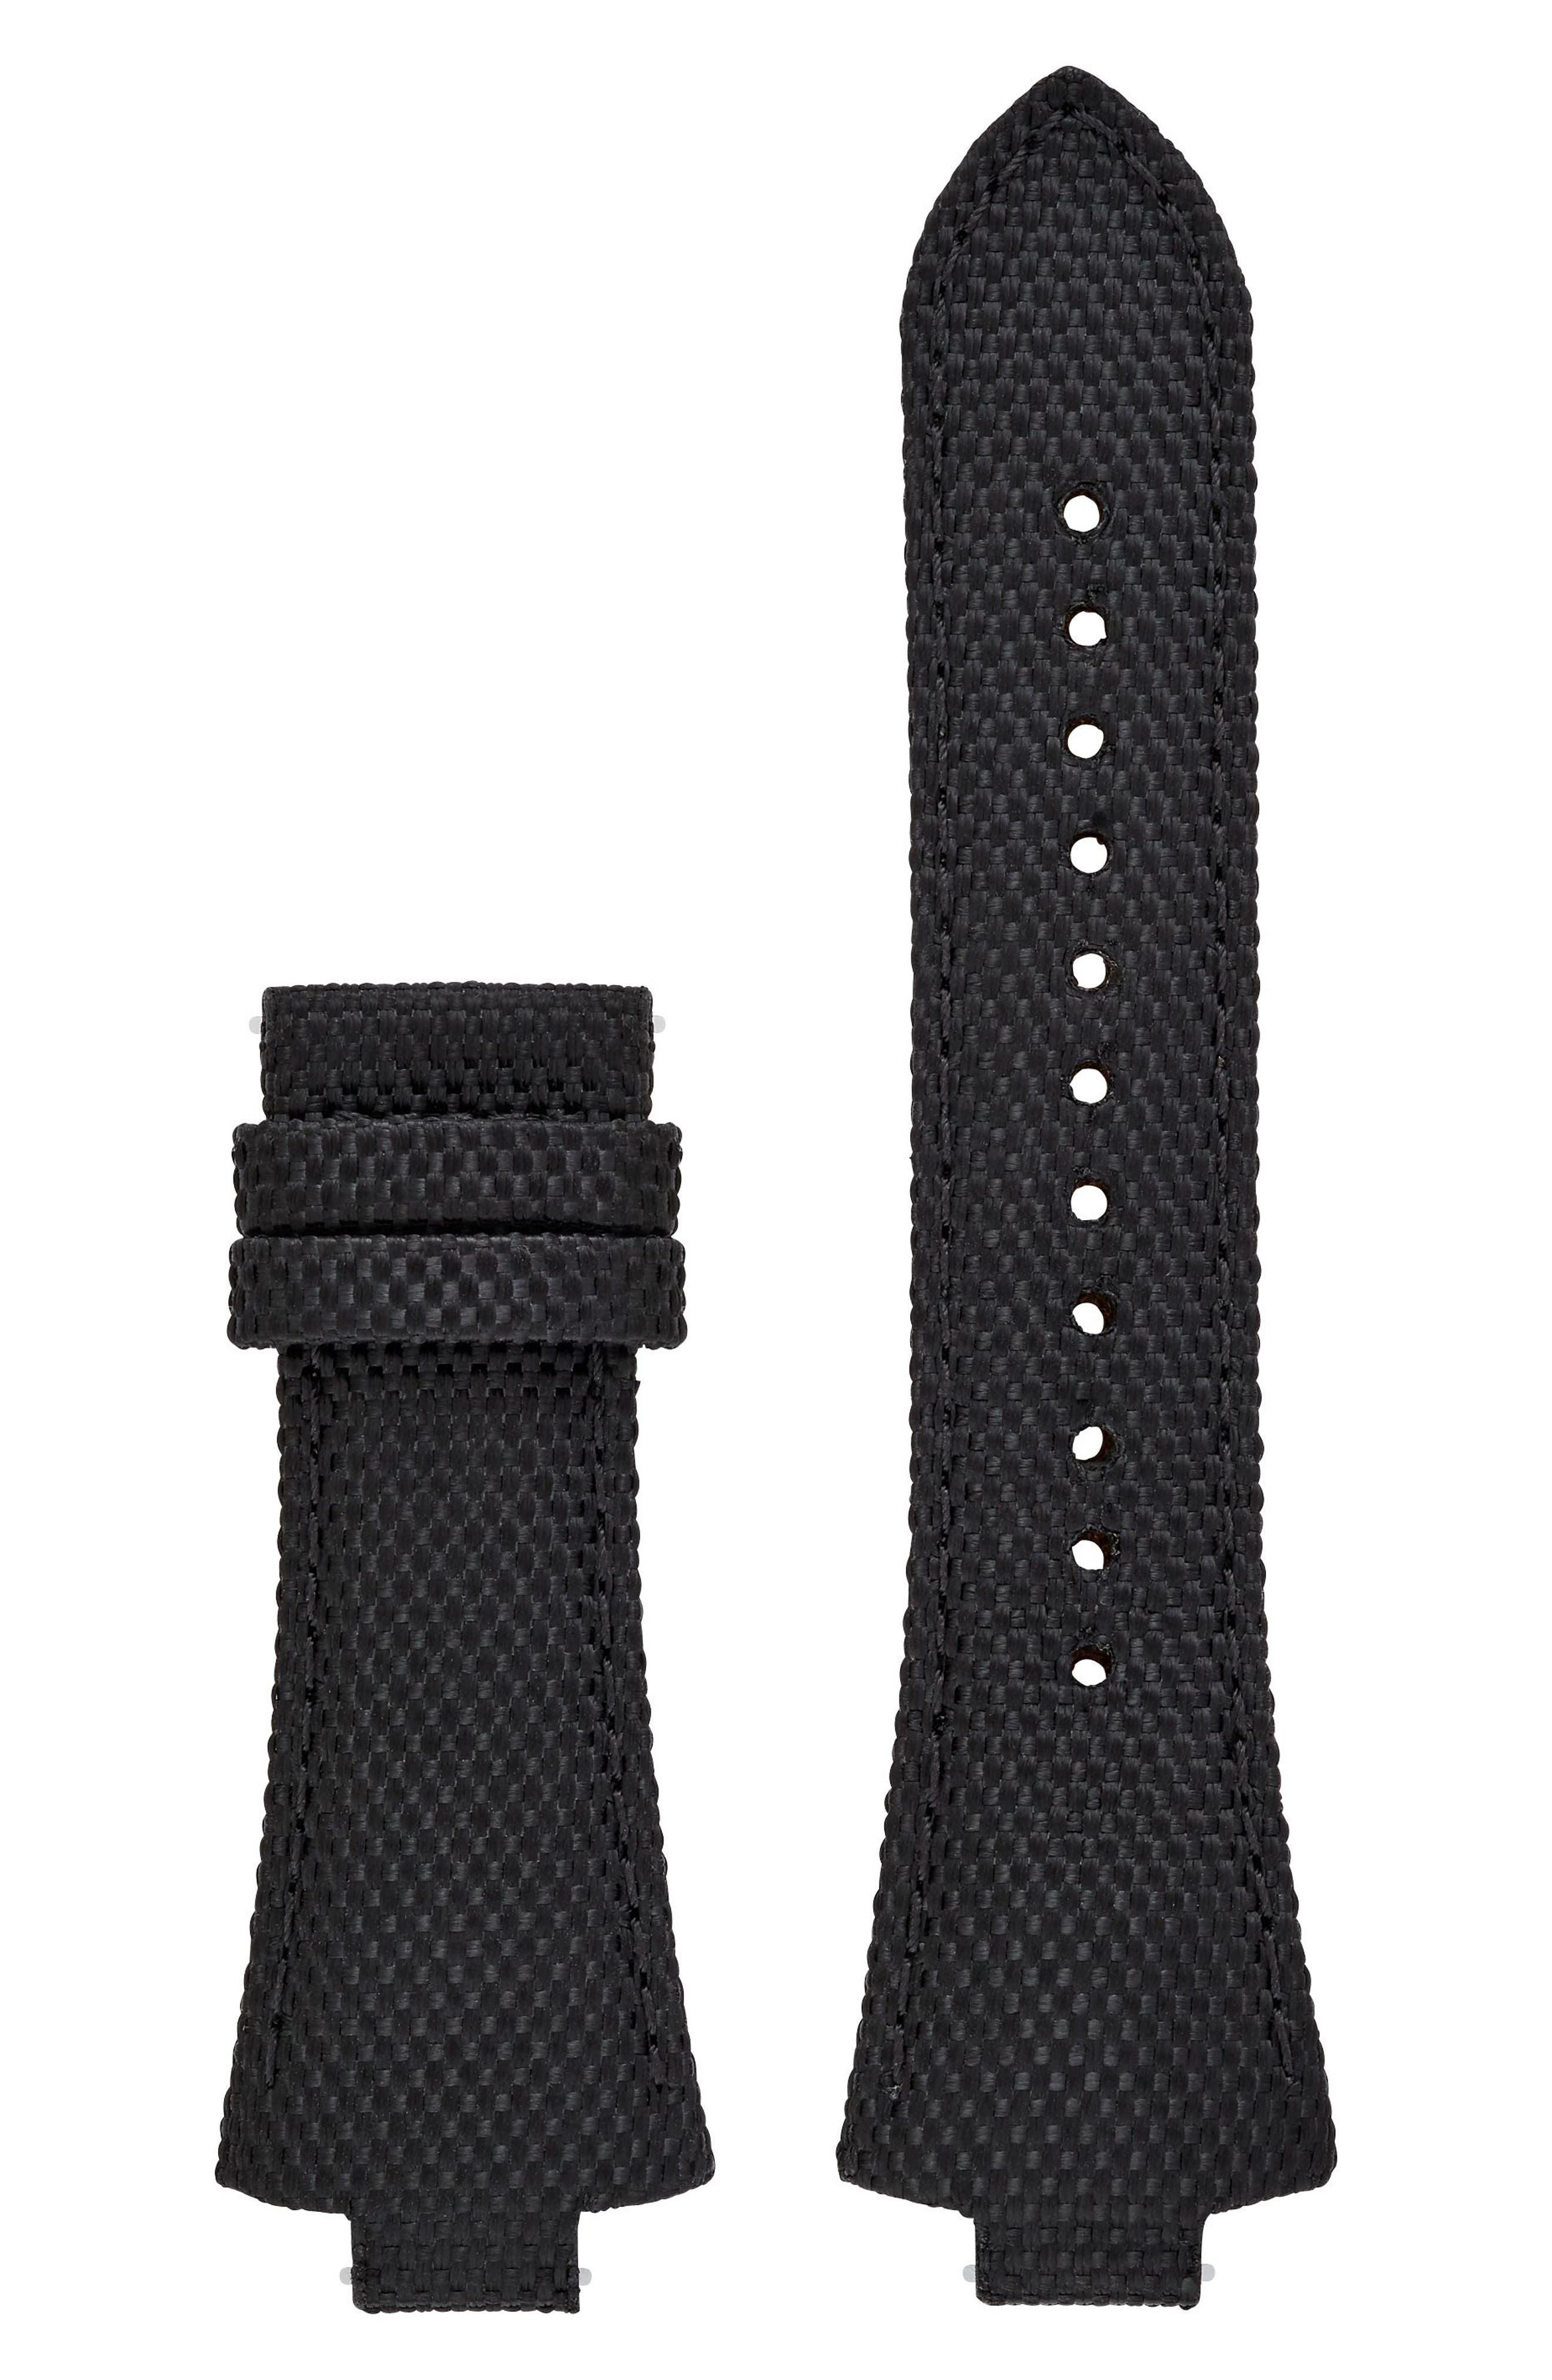 MICHAEL KORS Dylan Interchangeable Leather Strap